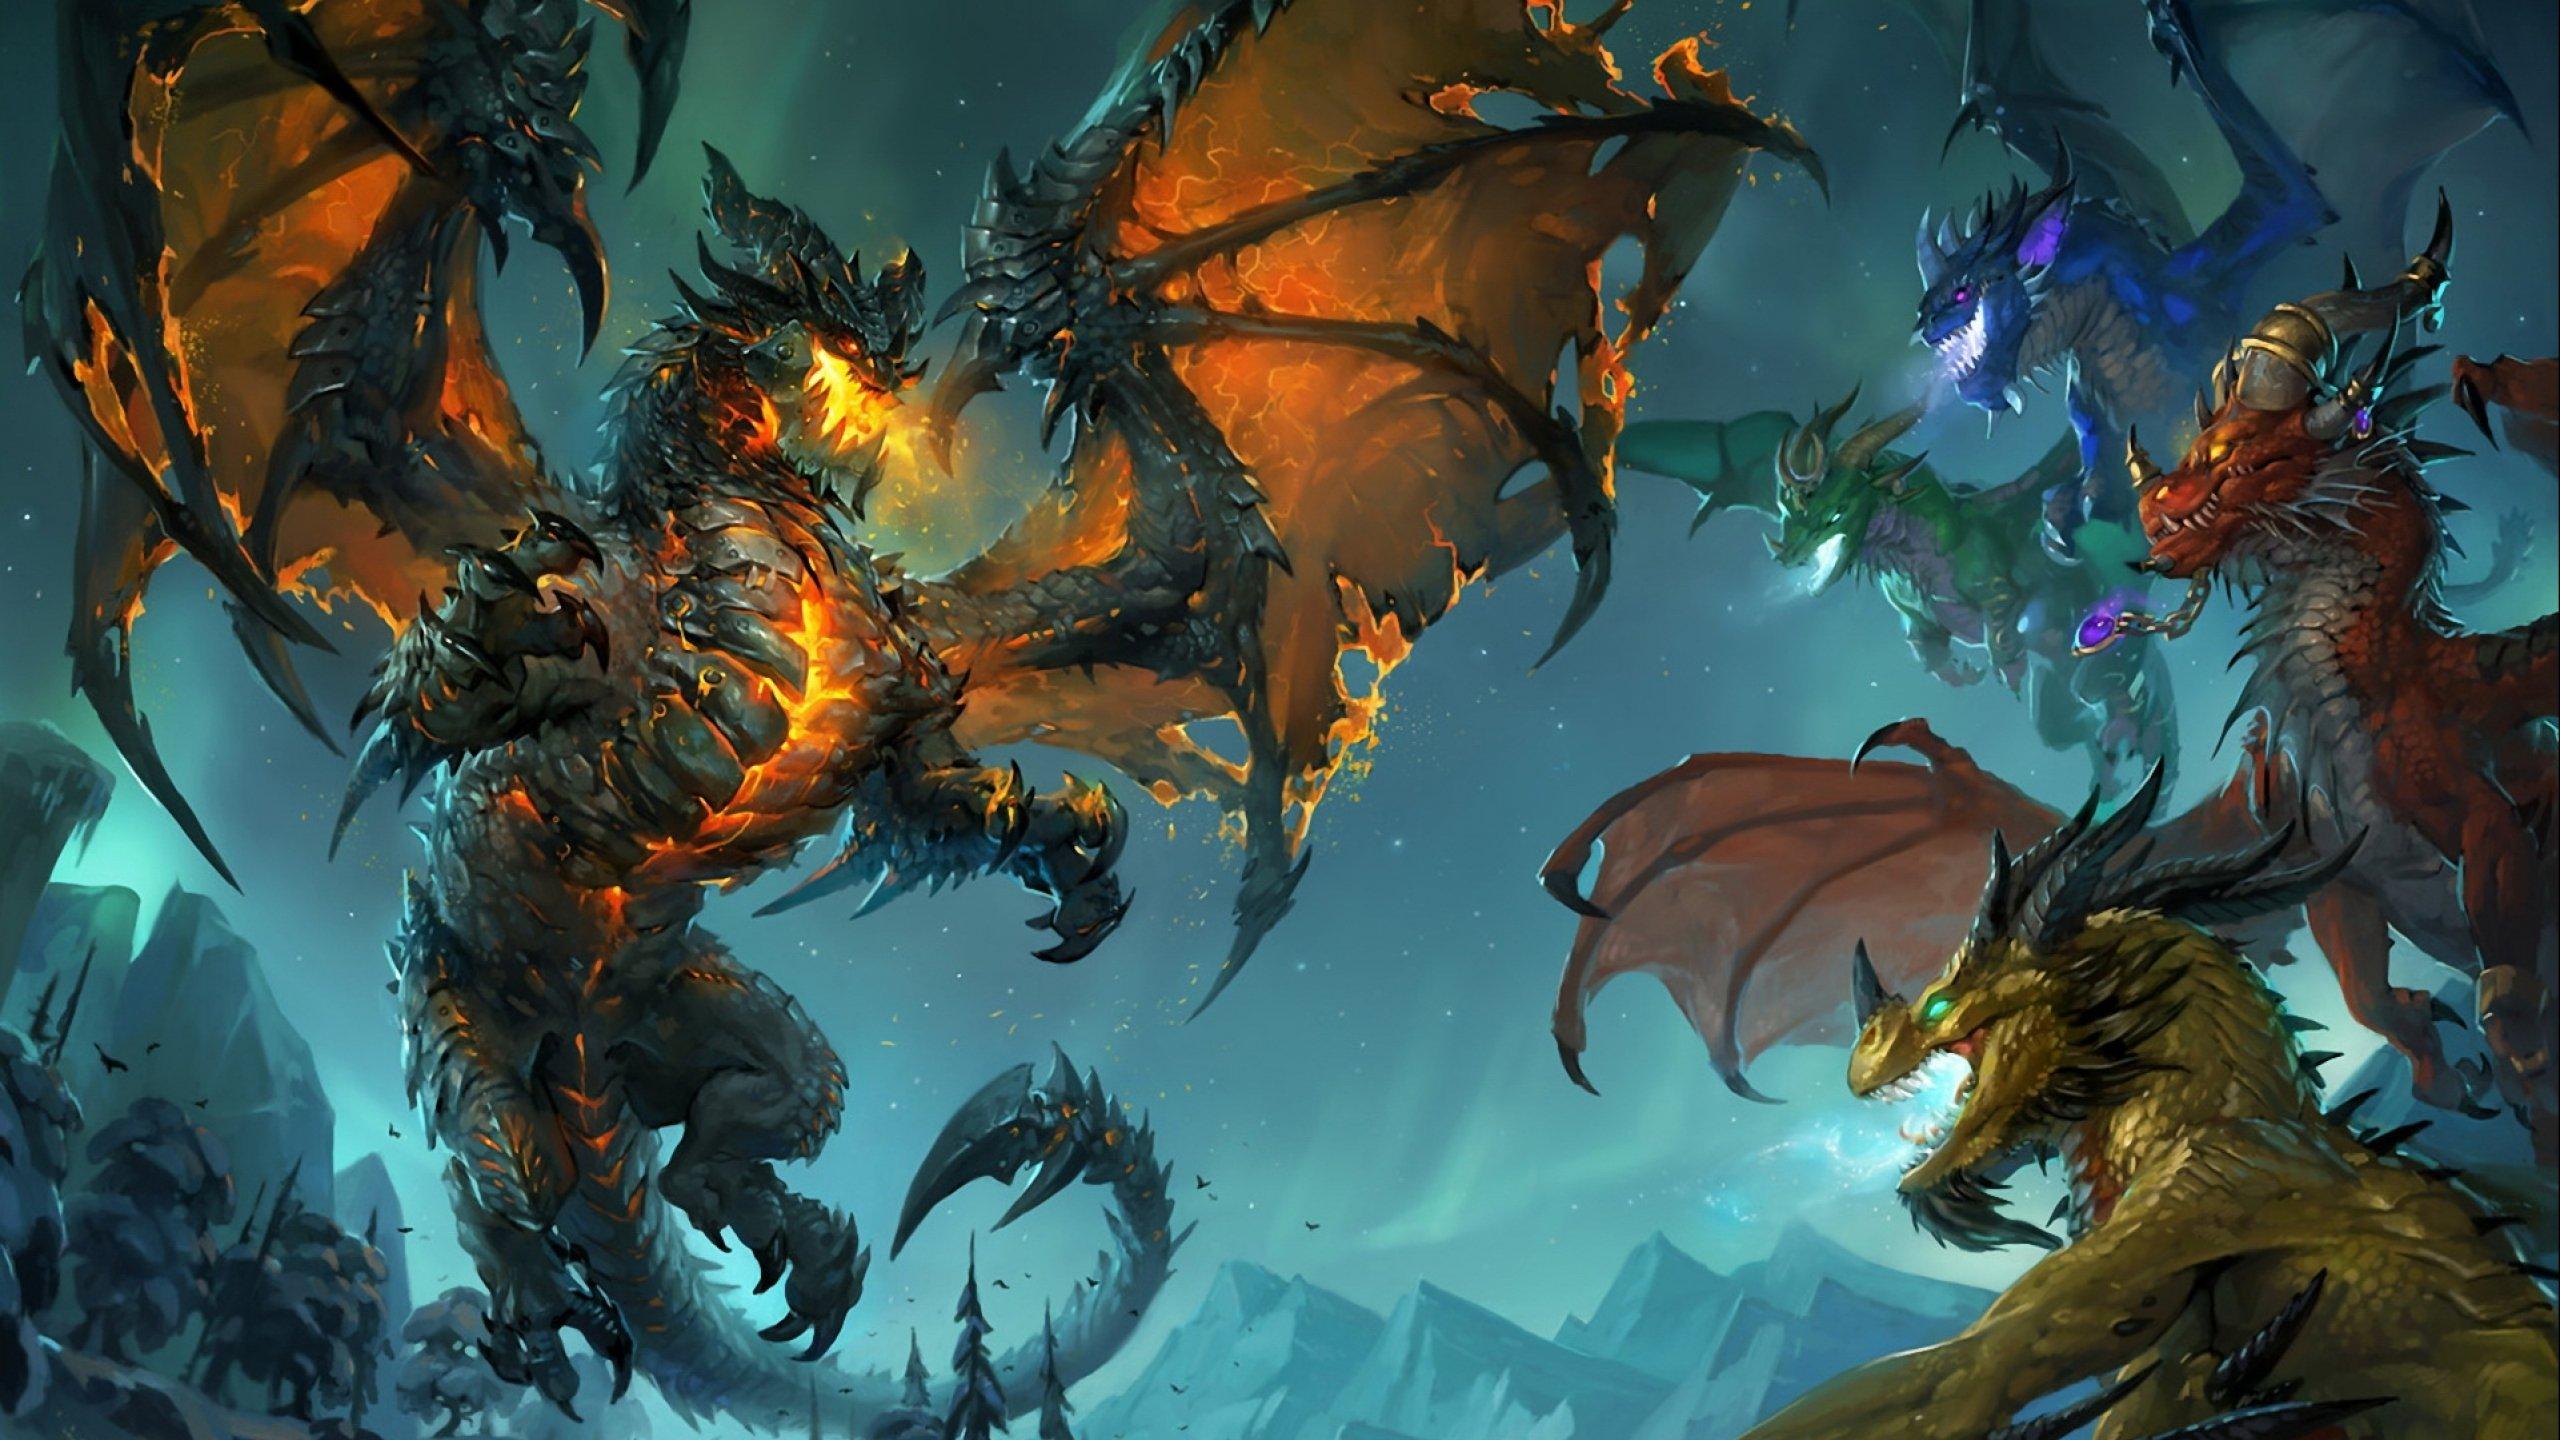 World Warcraft Fantasy Artwork Warrior D Wallpaper 2560x1440